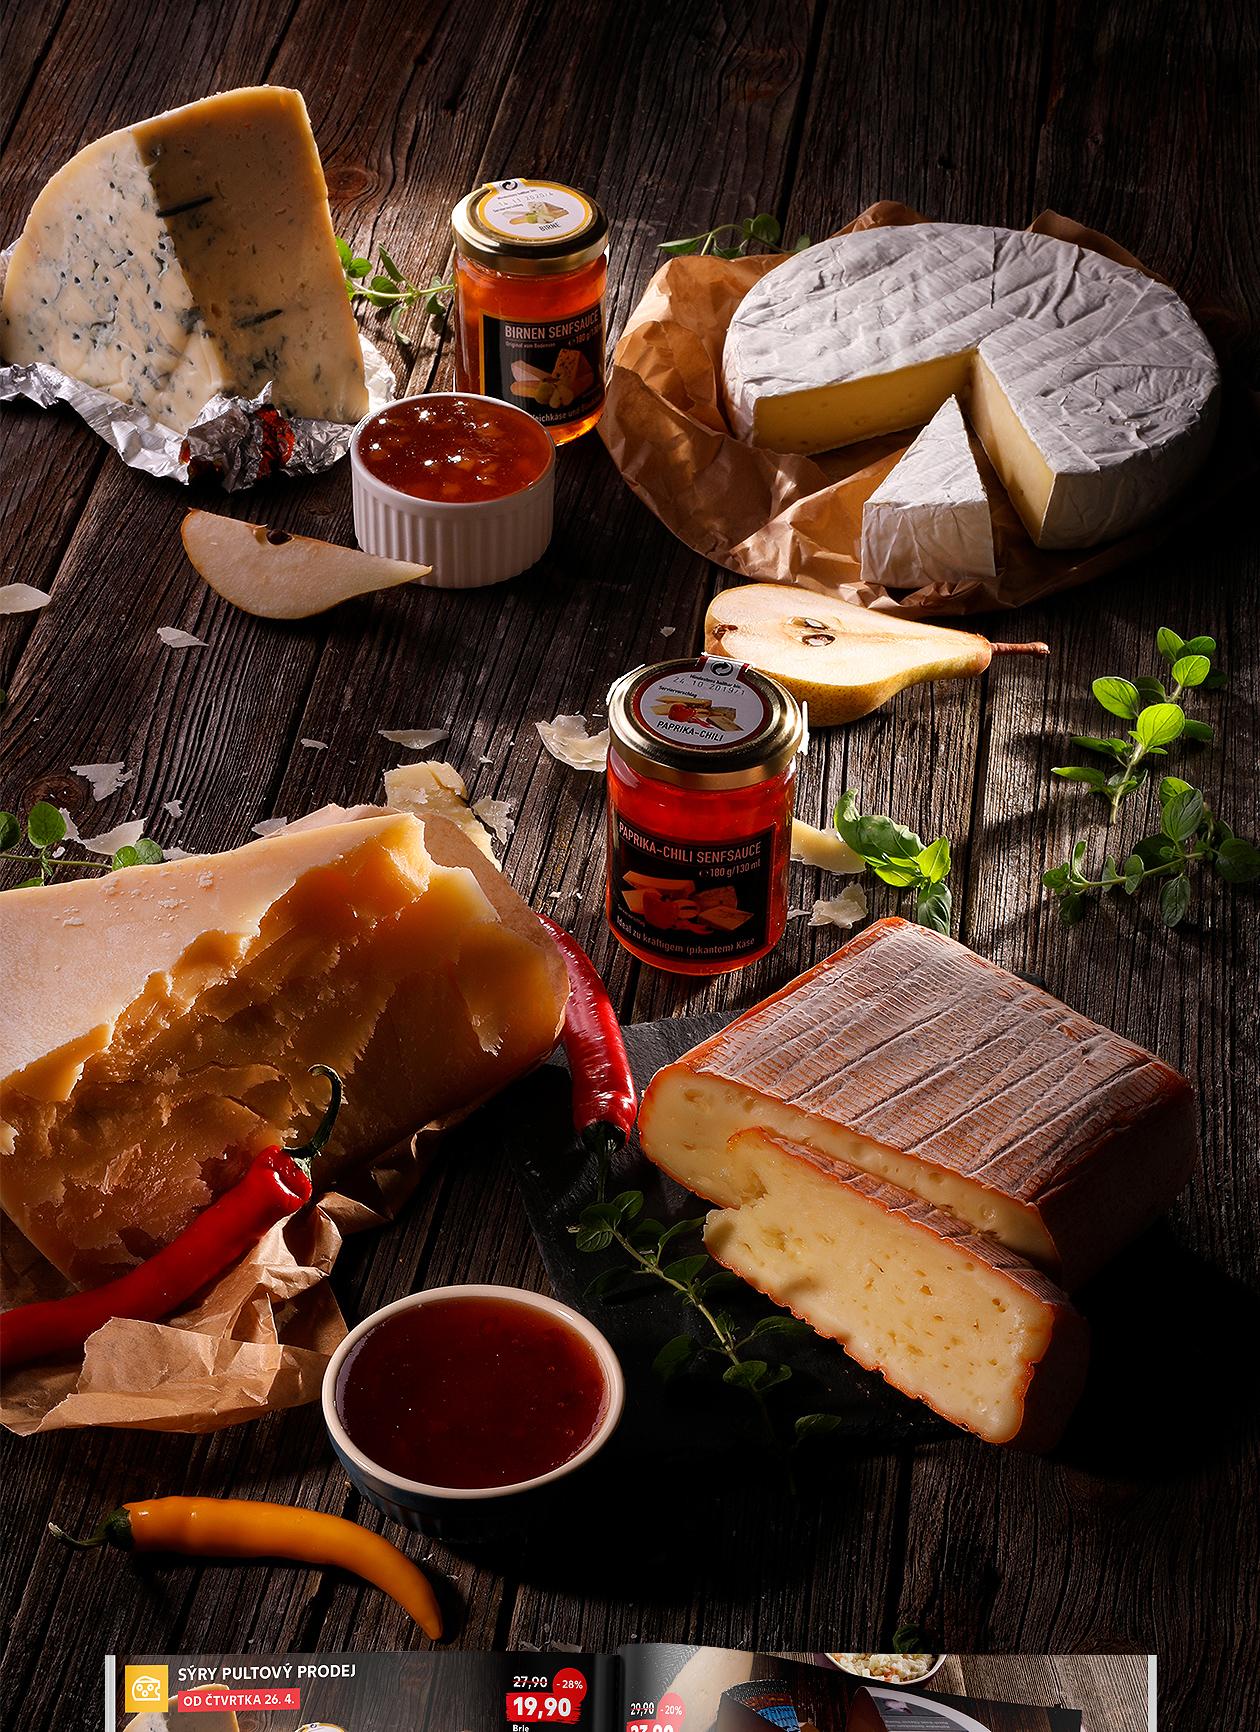 foodstyling fotografia Kaufland syry